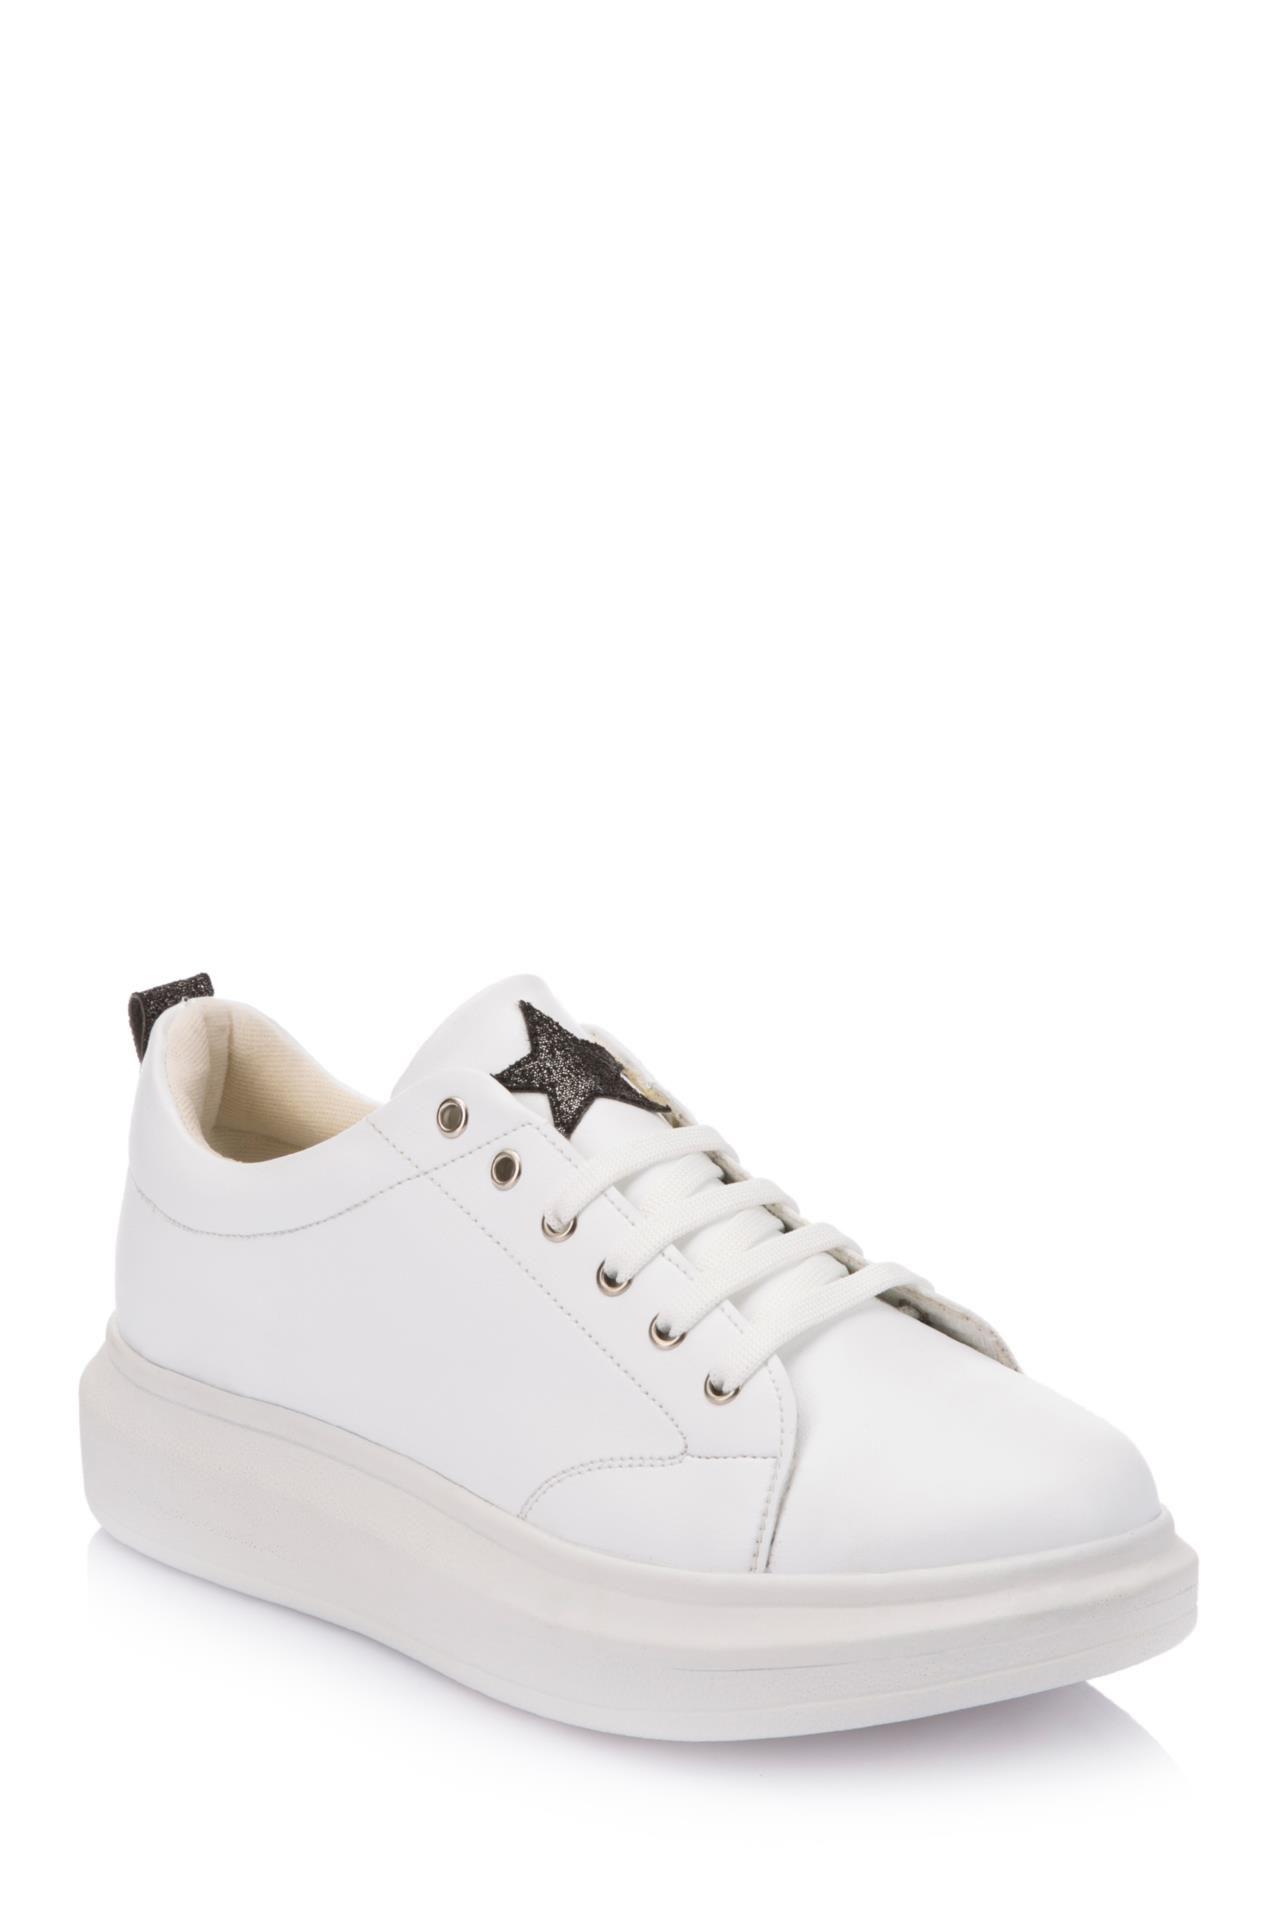 Defacto Marka Yuksek Taban Spor Ayakkabi Yuksek Topuklu Ozelligi Ile Uzun Yuruyuslerinizde Konfor Saglayac Vans Old Skool Sneaker White Sneaker Vans Sneaker